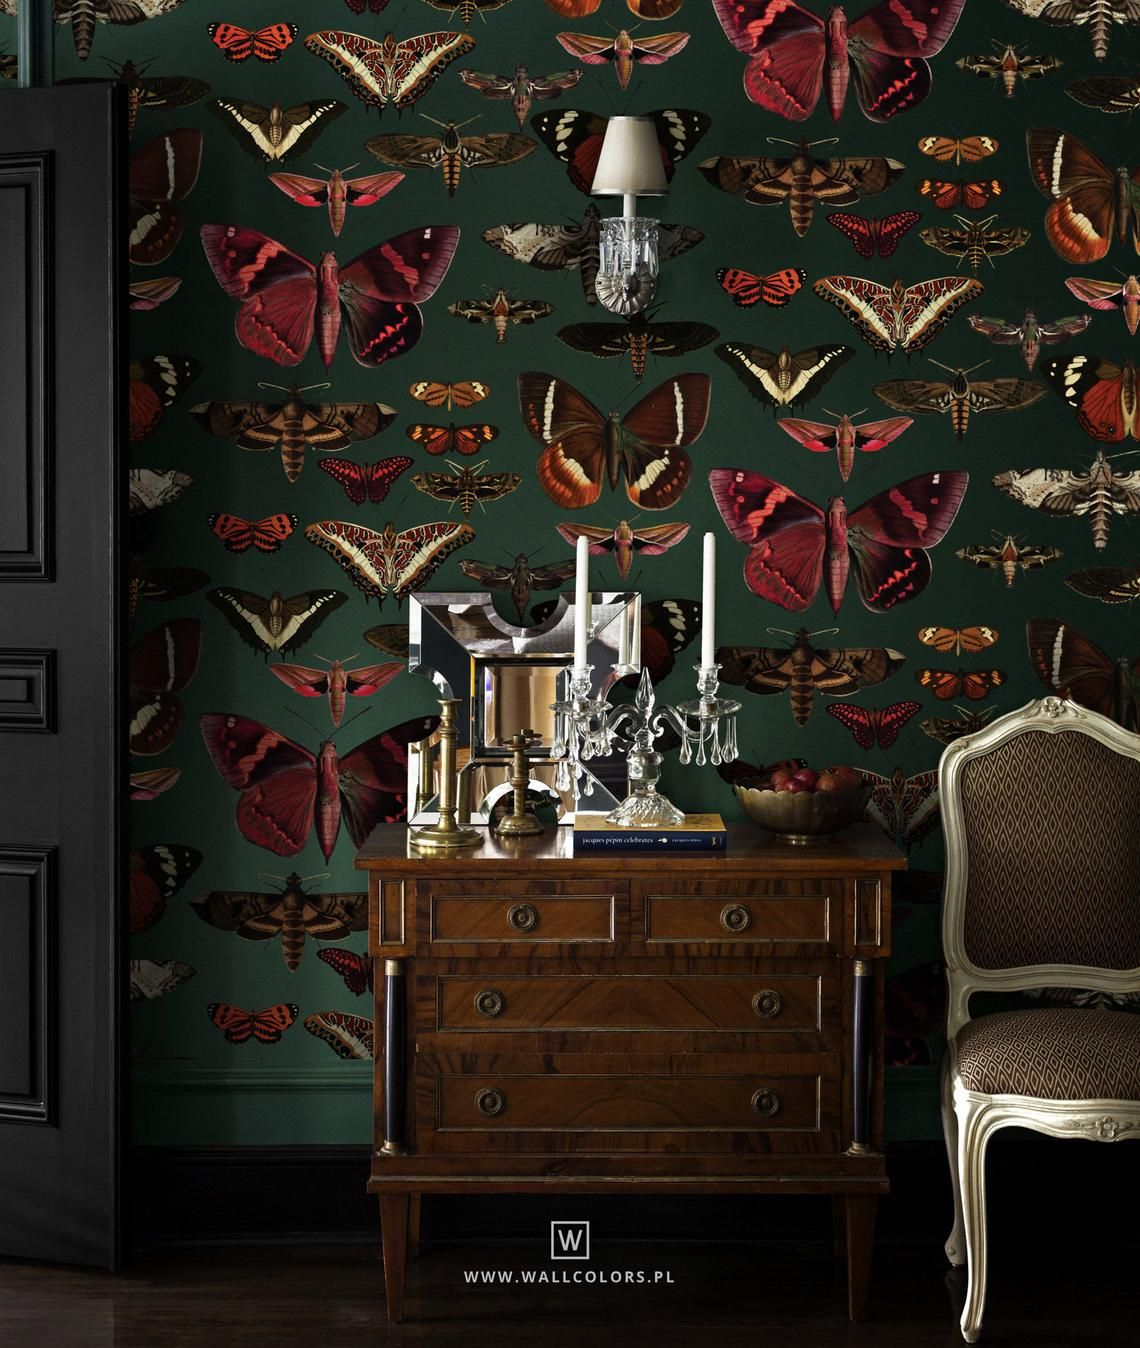 Removable vintage wallpaper, butterflies pattern,